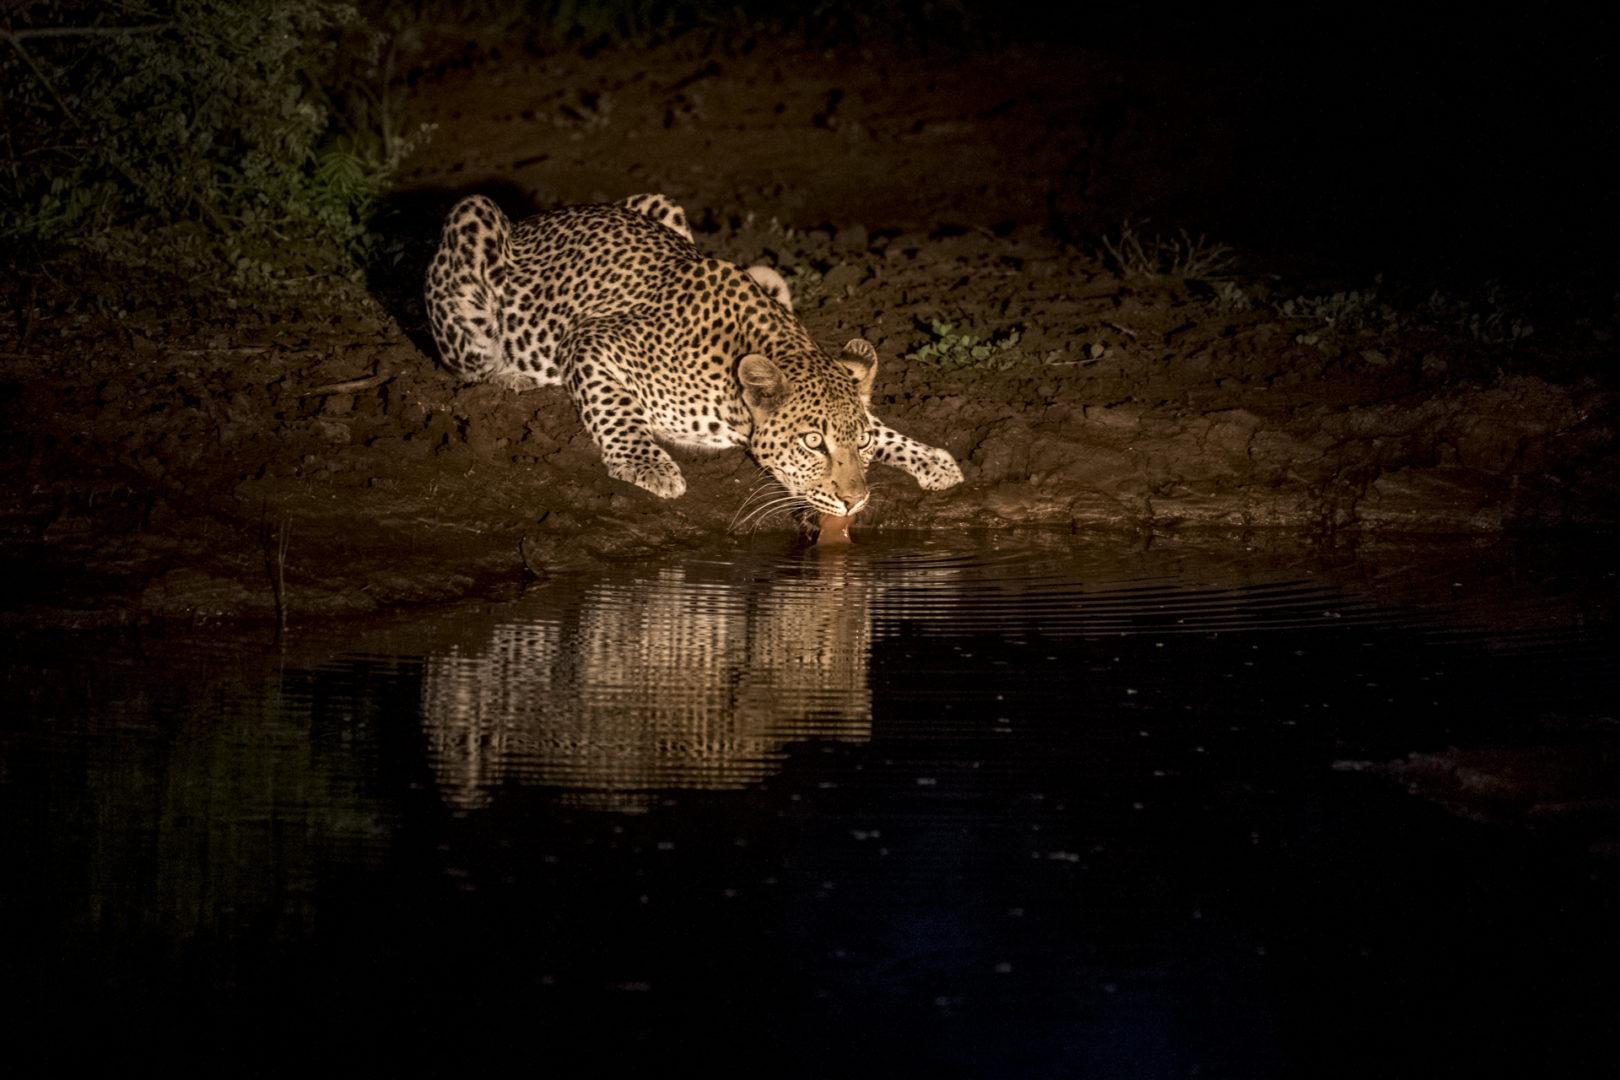 4 Day madikwe Photo Tour Leopard drinking at night